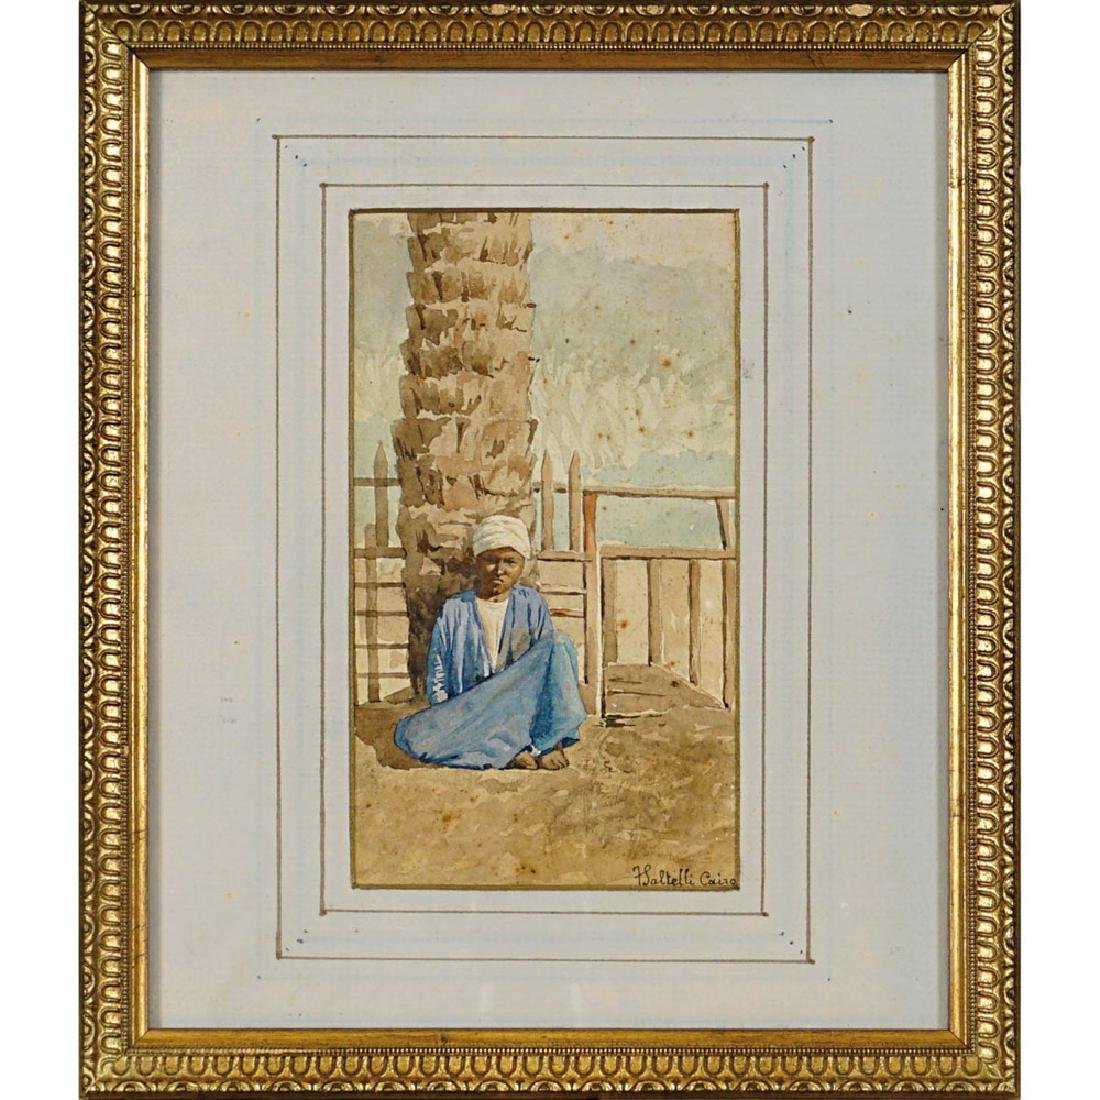 Orientalist painter